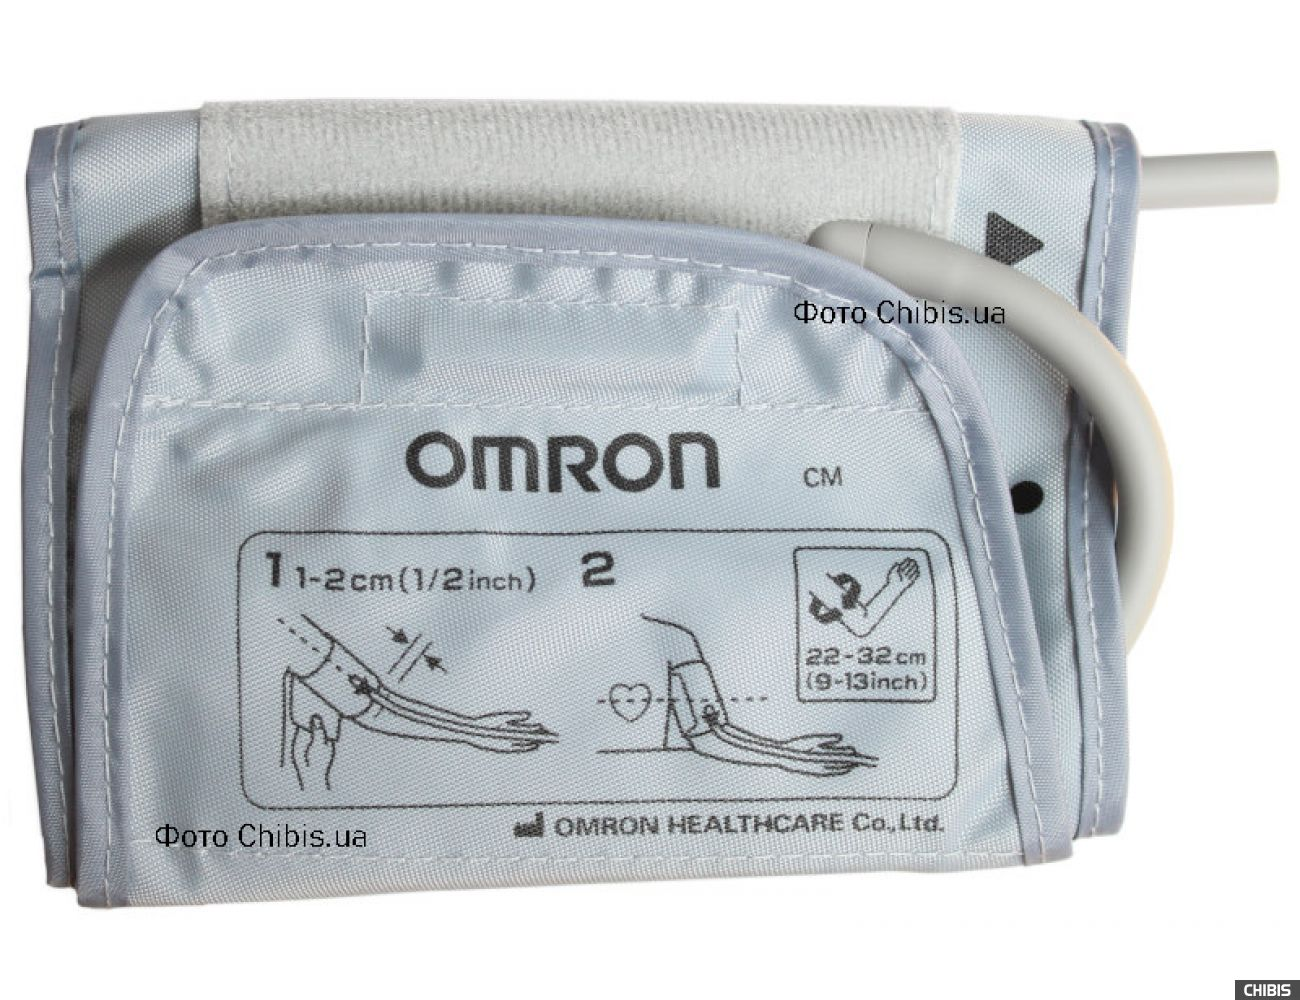 Манжета для тонометра Omron CM-RU2 стандартная 22-32см